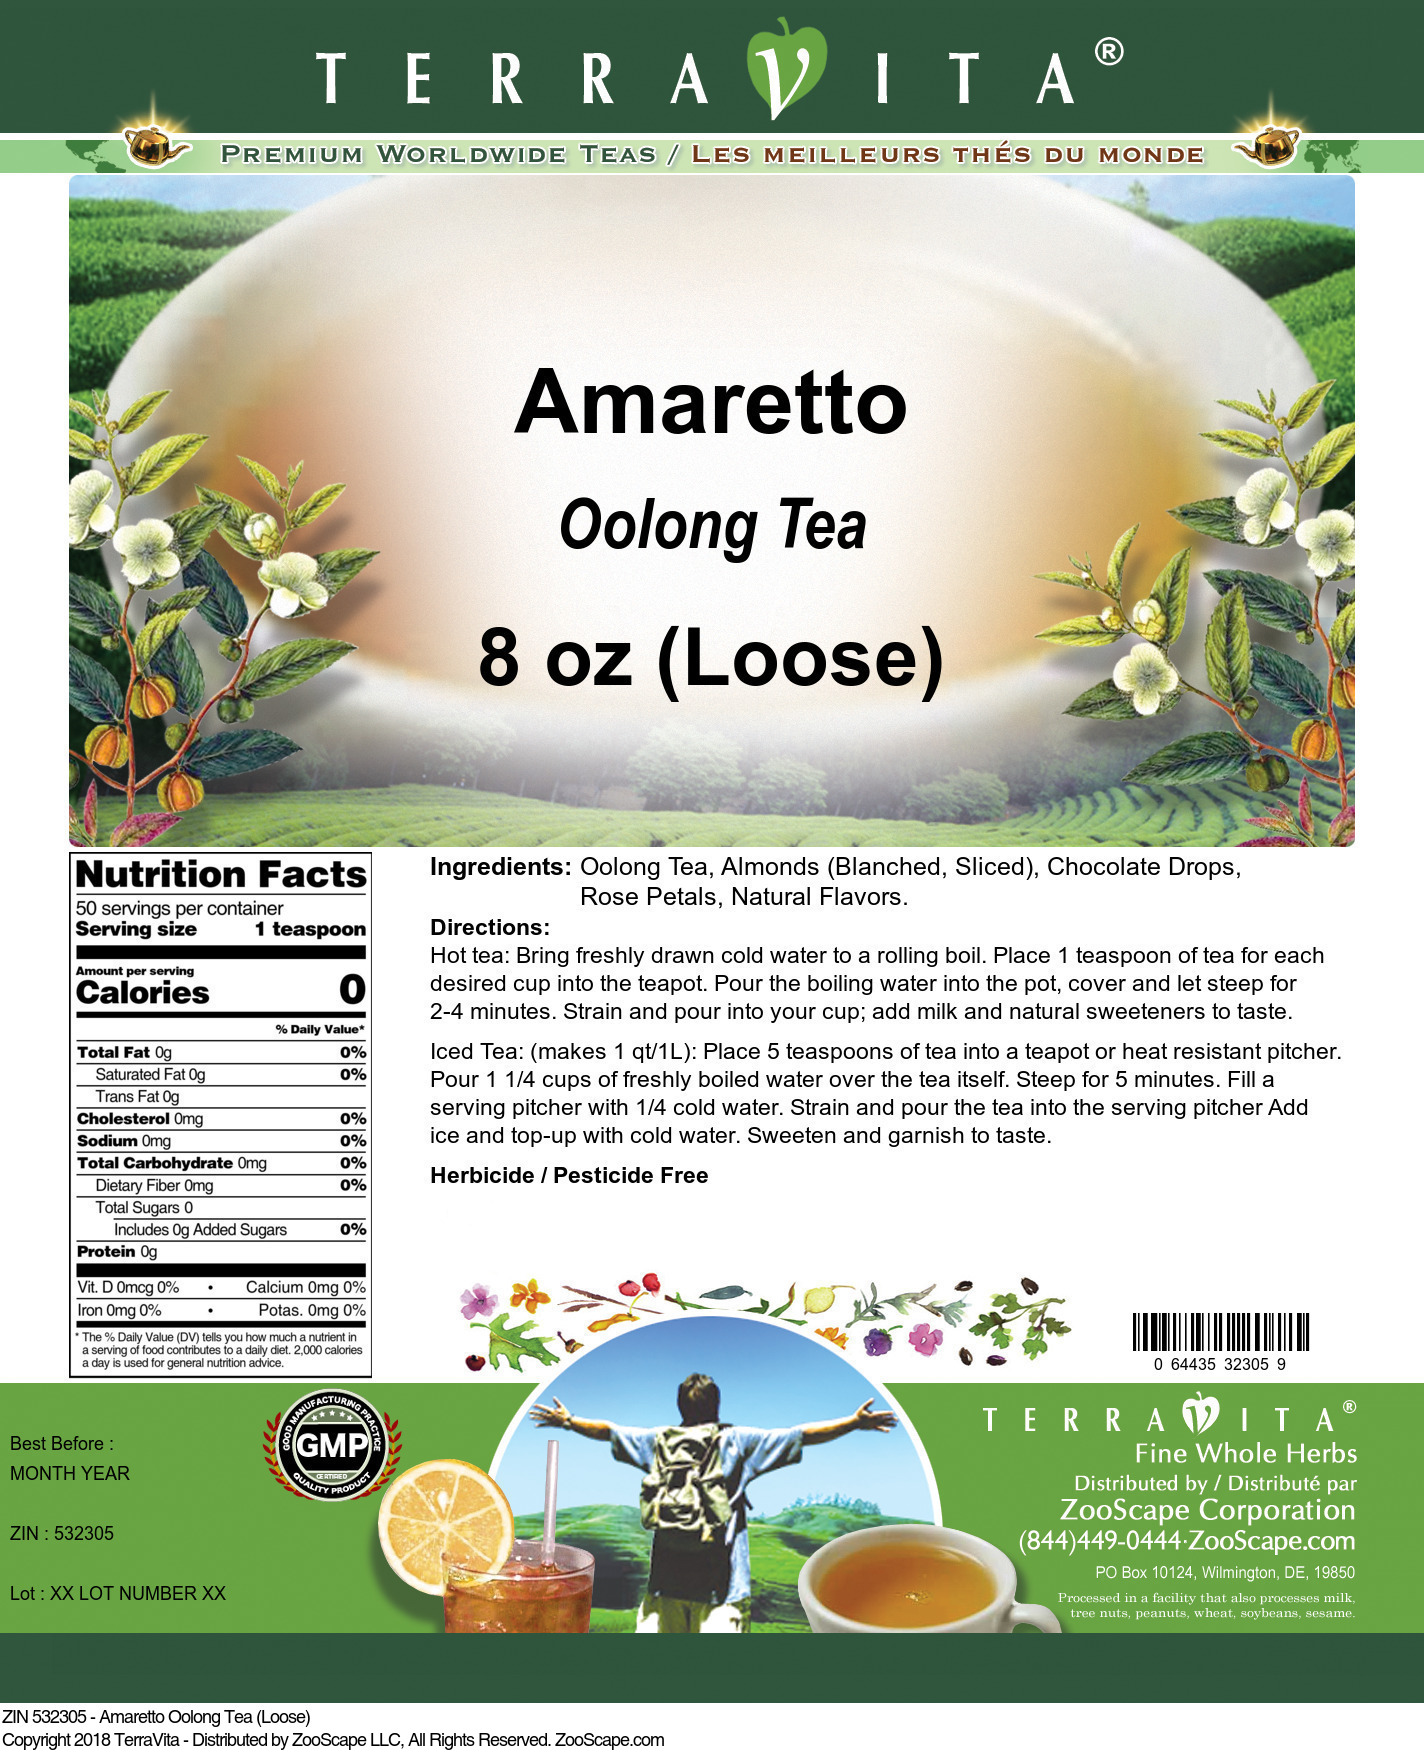 Amaretto Oolong Tea (Loose)